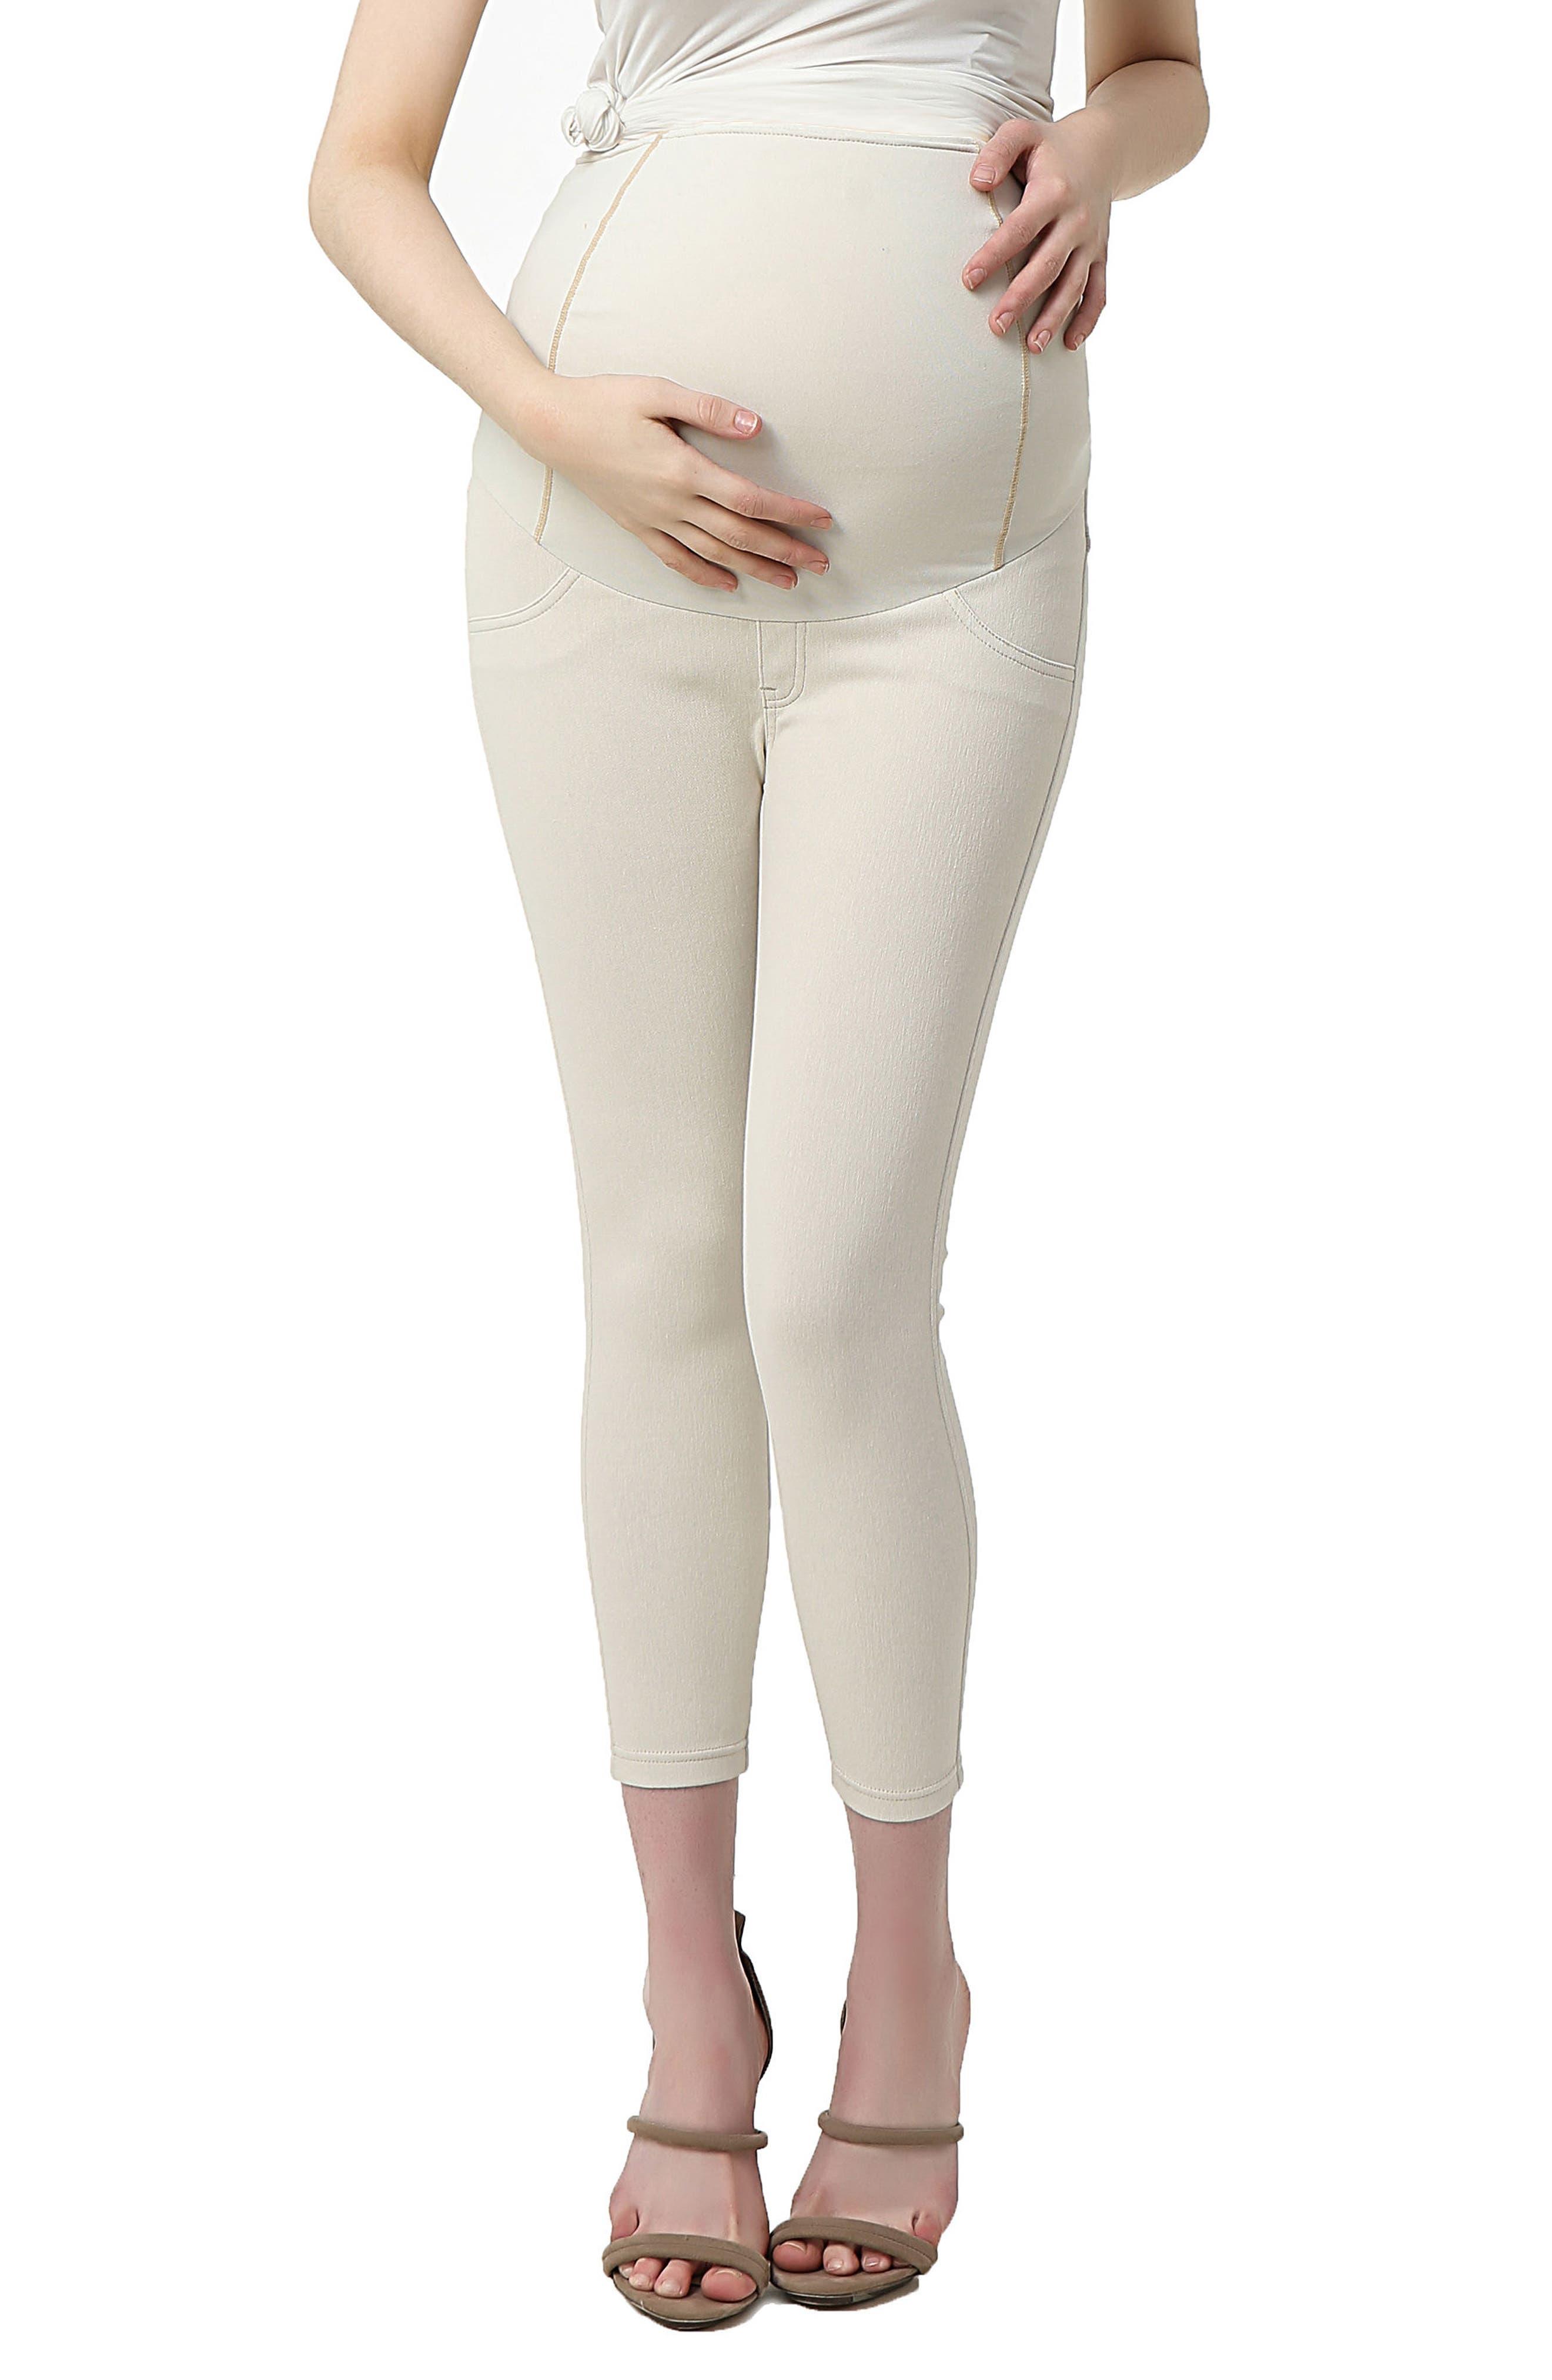 Kimi And Kai Tia Cropped Denim Maternity Leggings, Beige